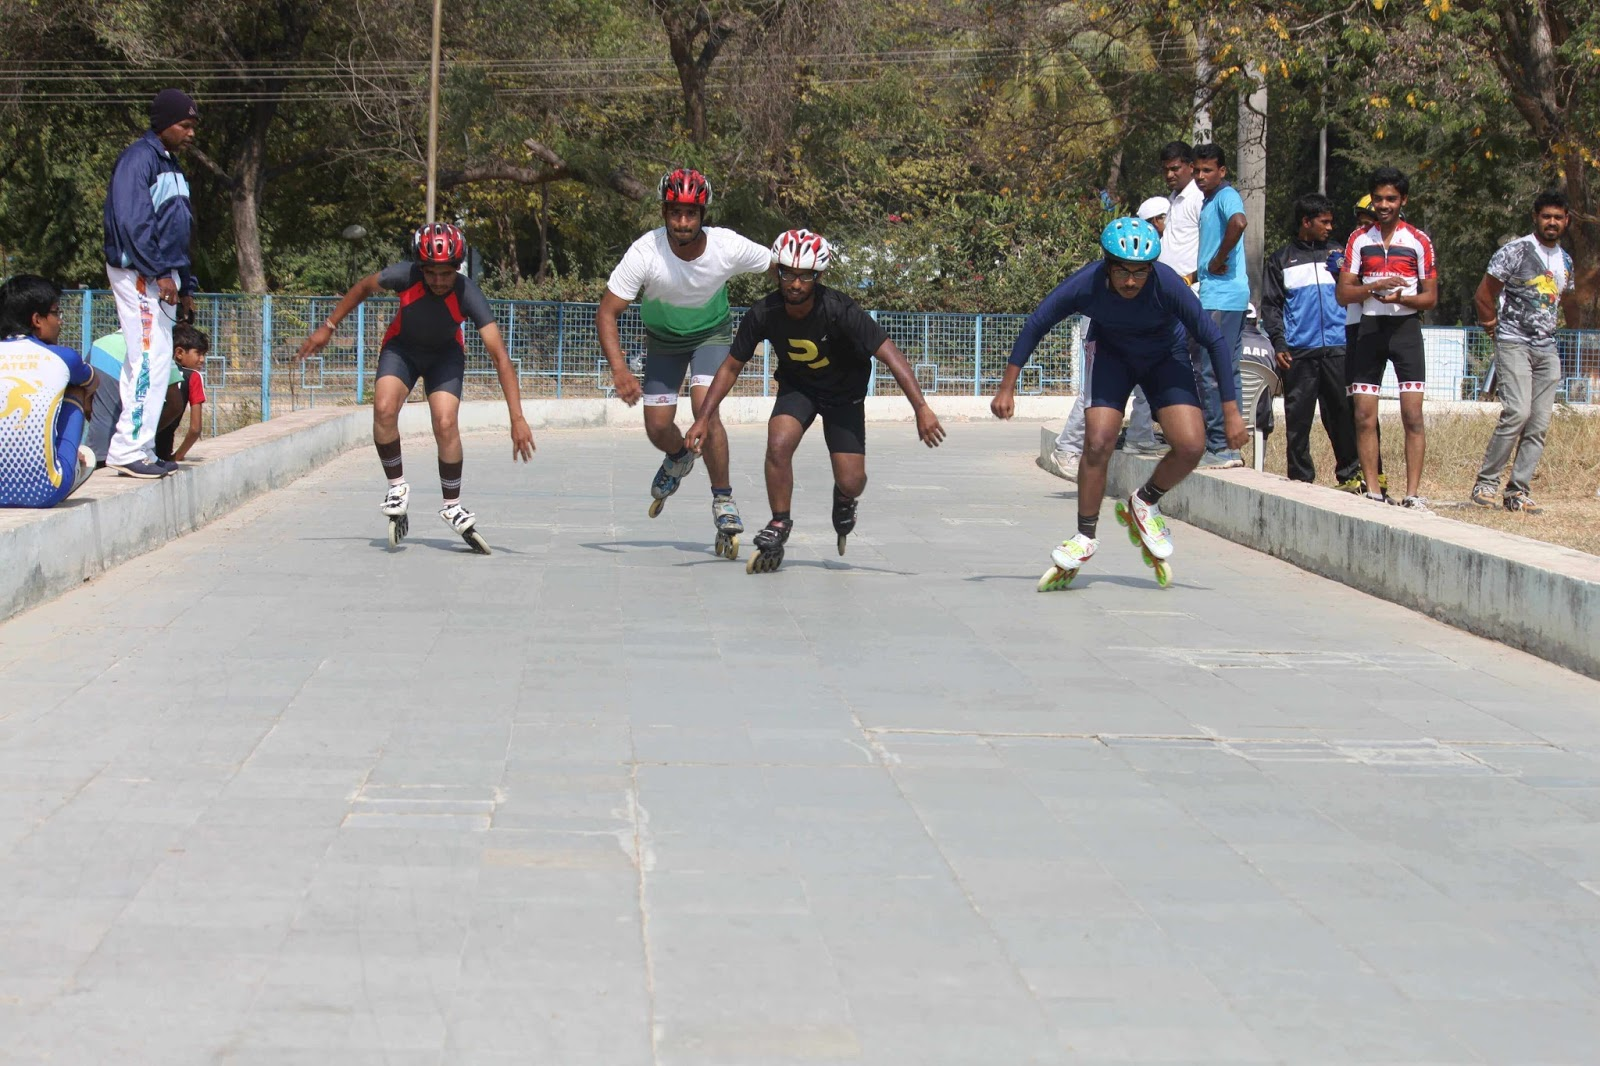 skating classes at mehdipatnam in hyderabad professional roller skates powerslide skates quad roller skates 4 wheels derby skates